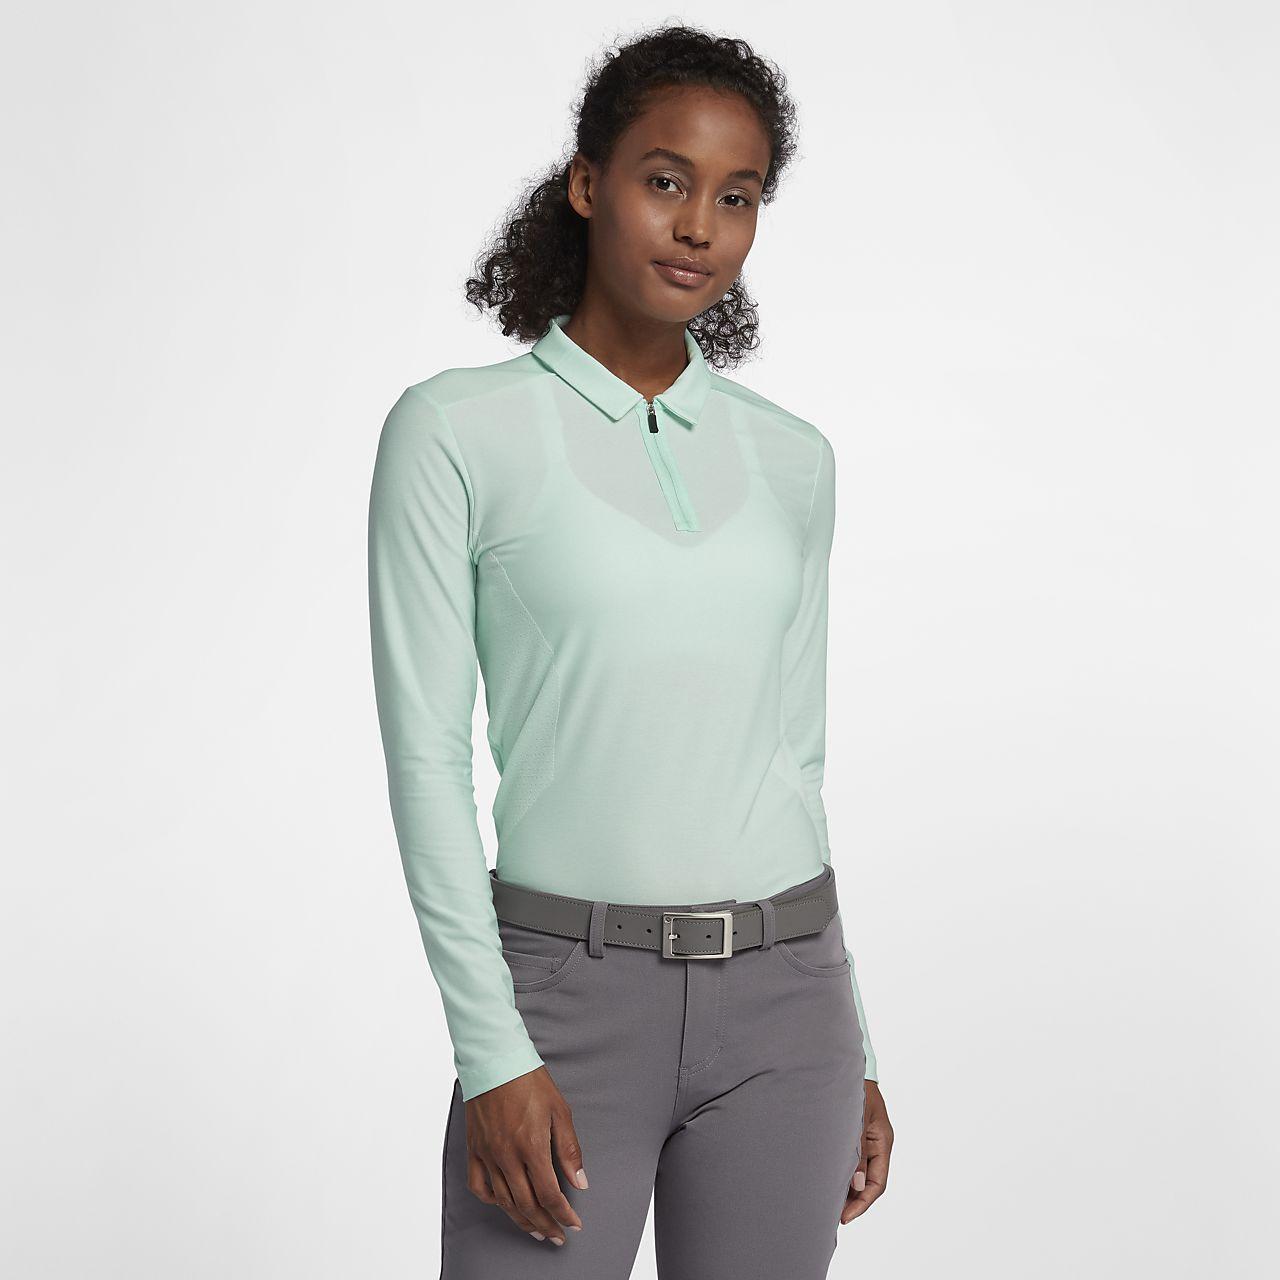 21e80e38ba9d Γυναικεία μακρυμάνικη μπλούζα πόλο για γκολφ Nike Zonal Cooling ...